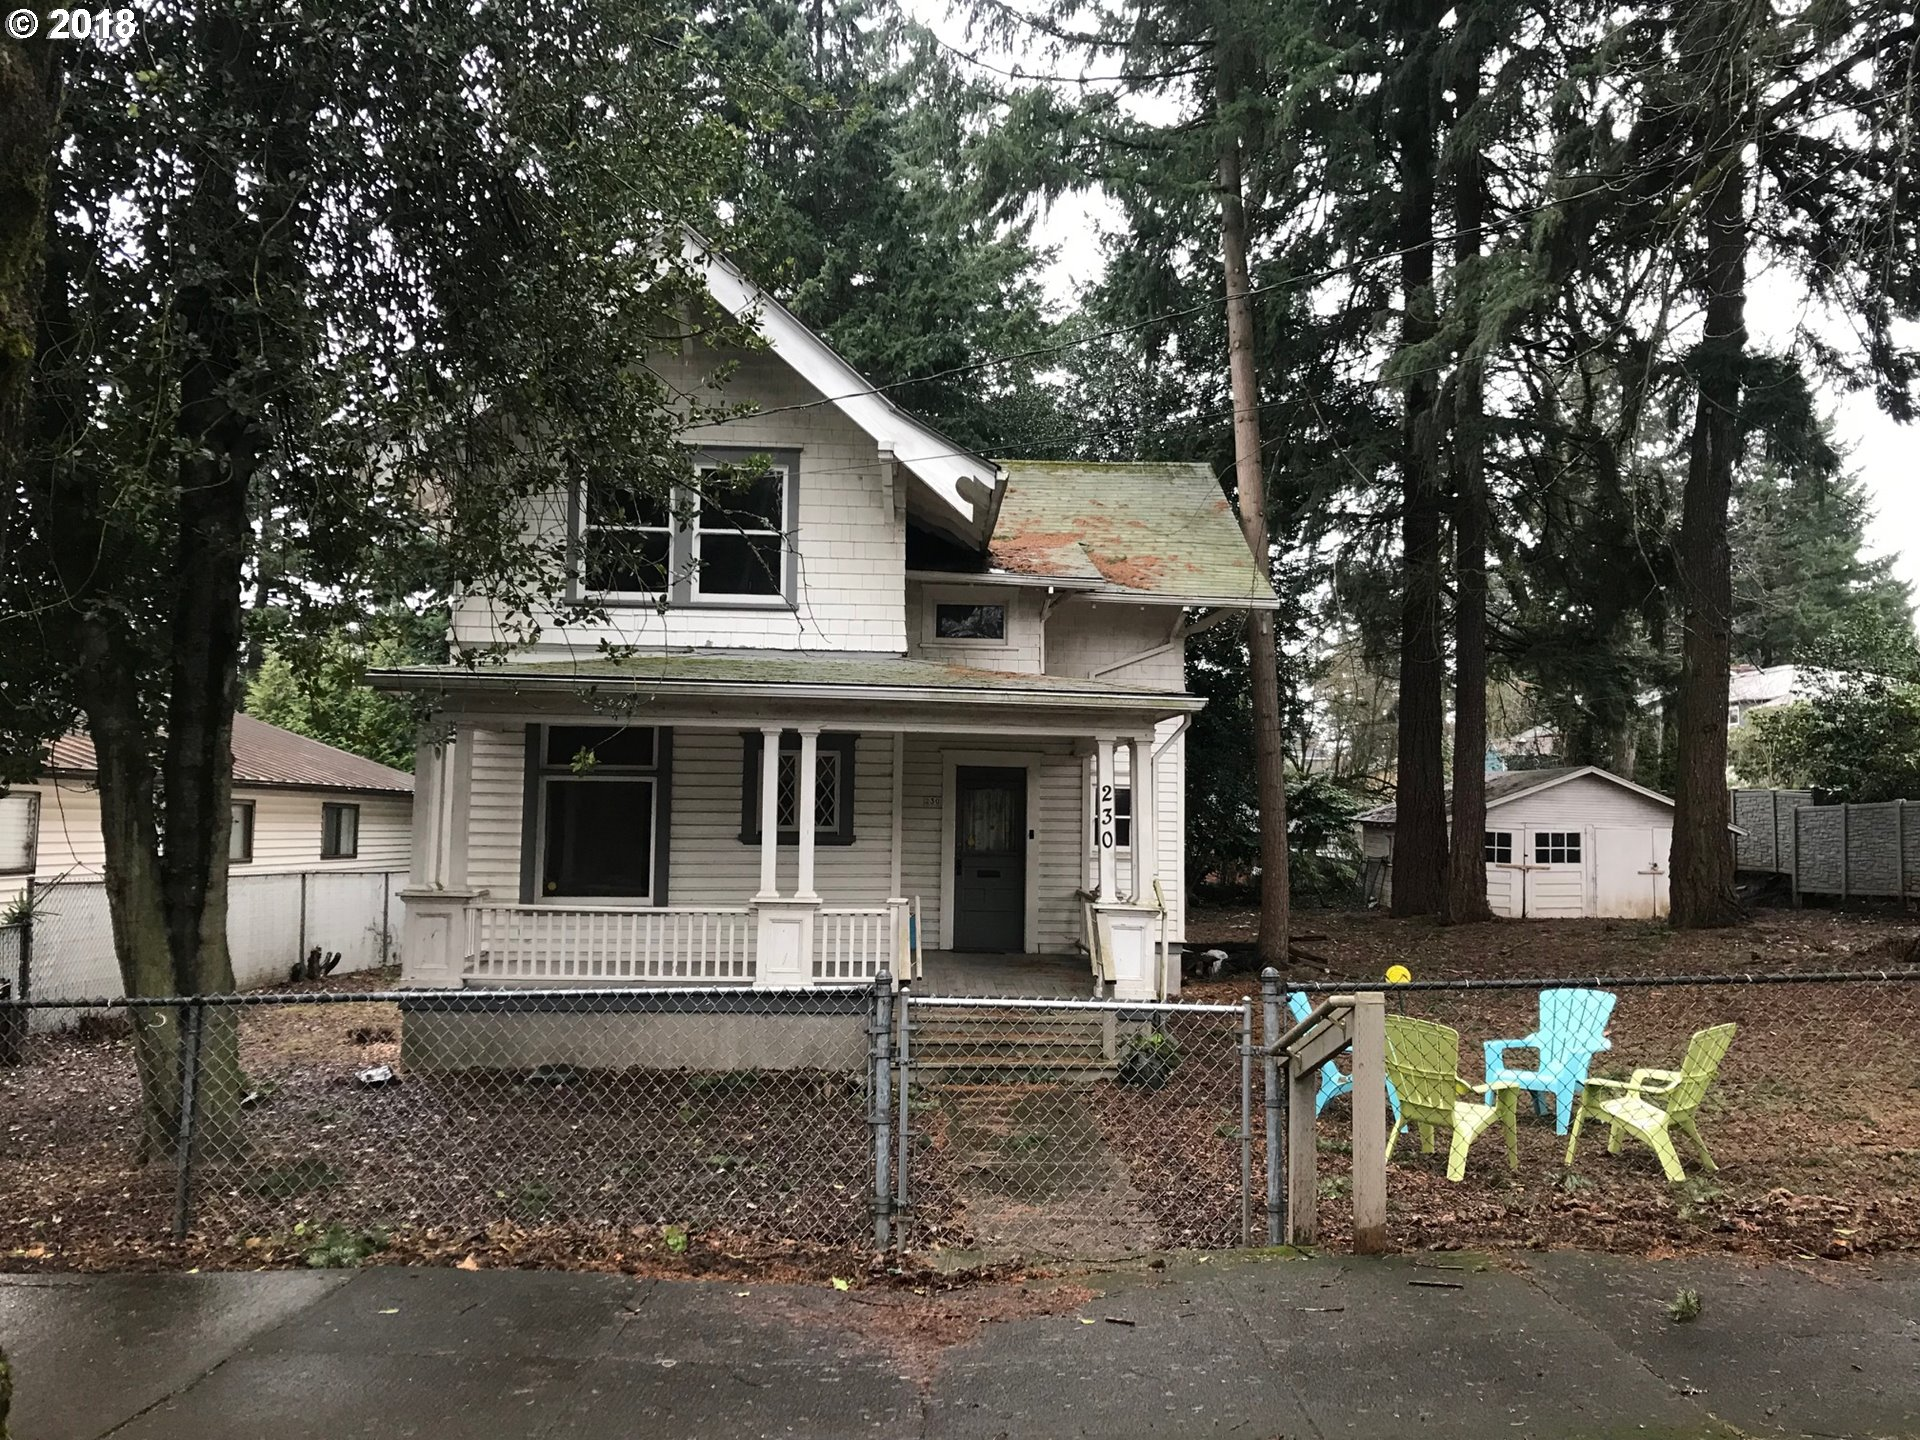 230 NE 65TH AVE Portland, OR 97213 - MLS #: 18233851